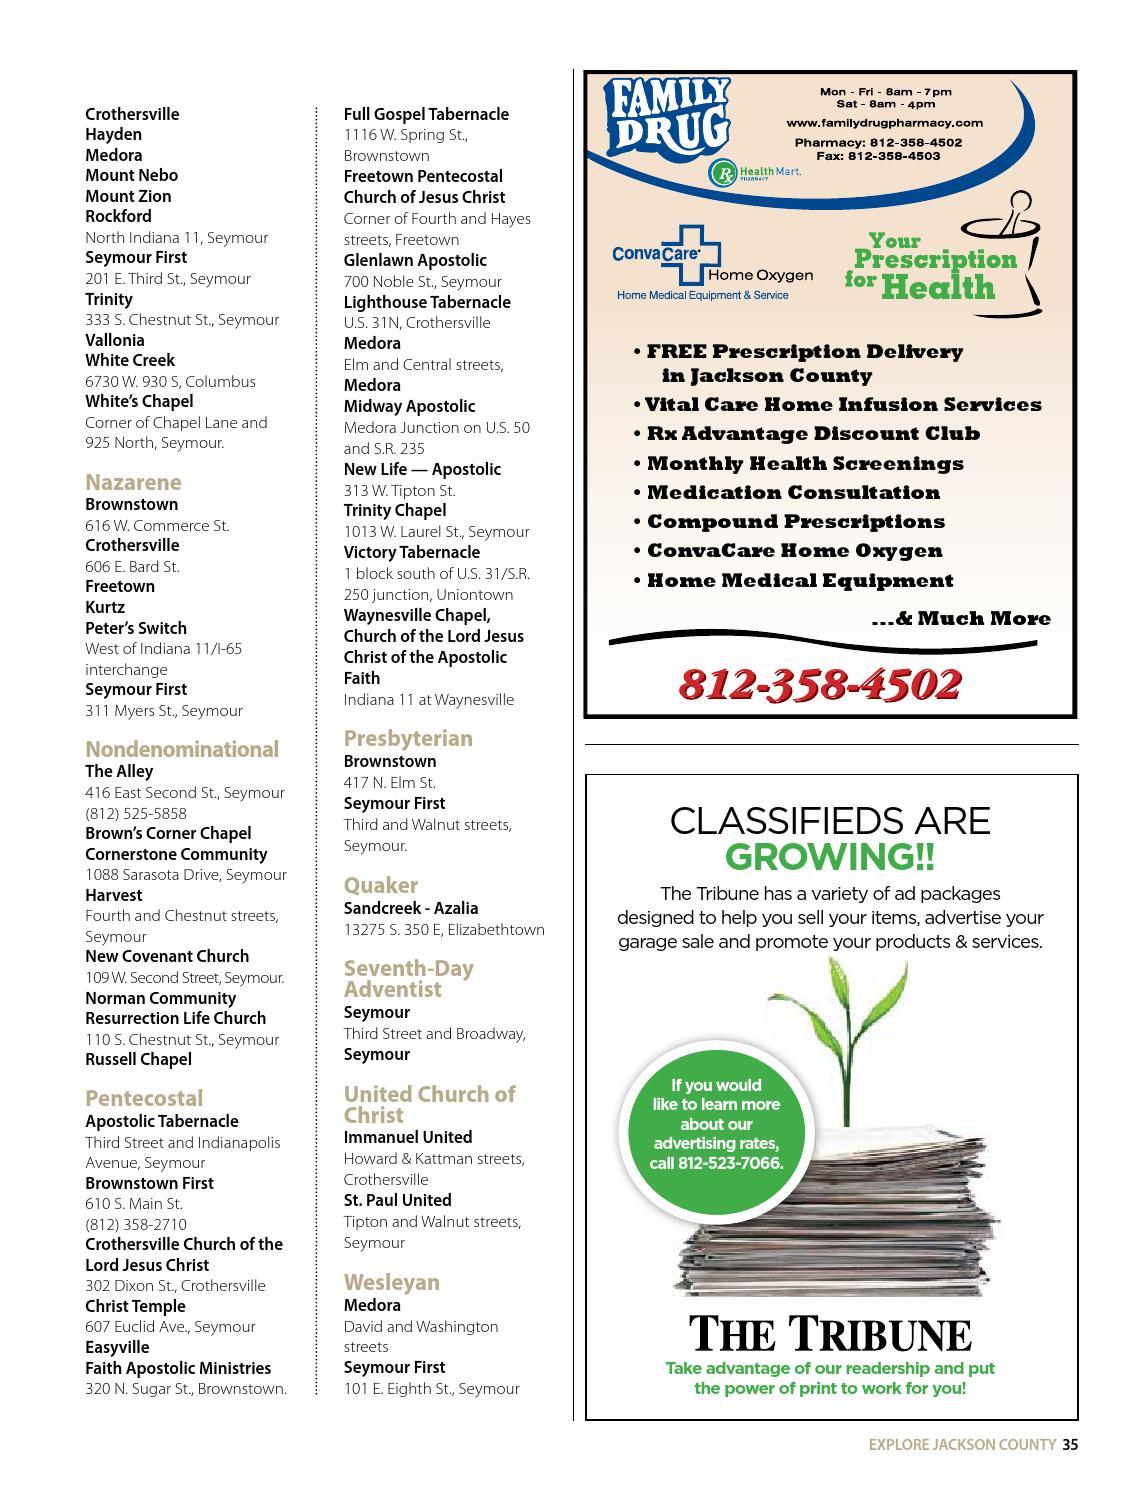 Explore Jackson County By HNE Media Magazines